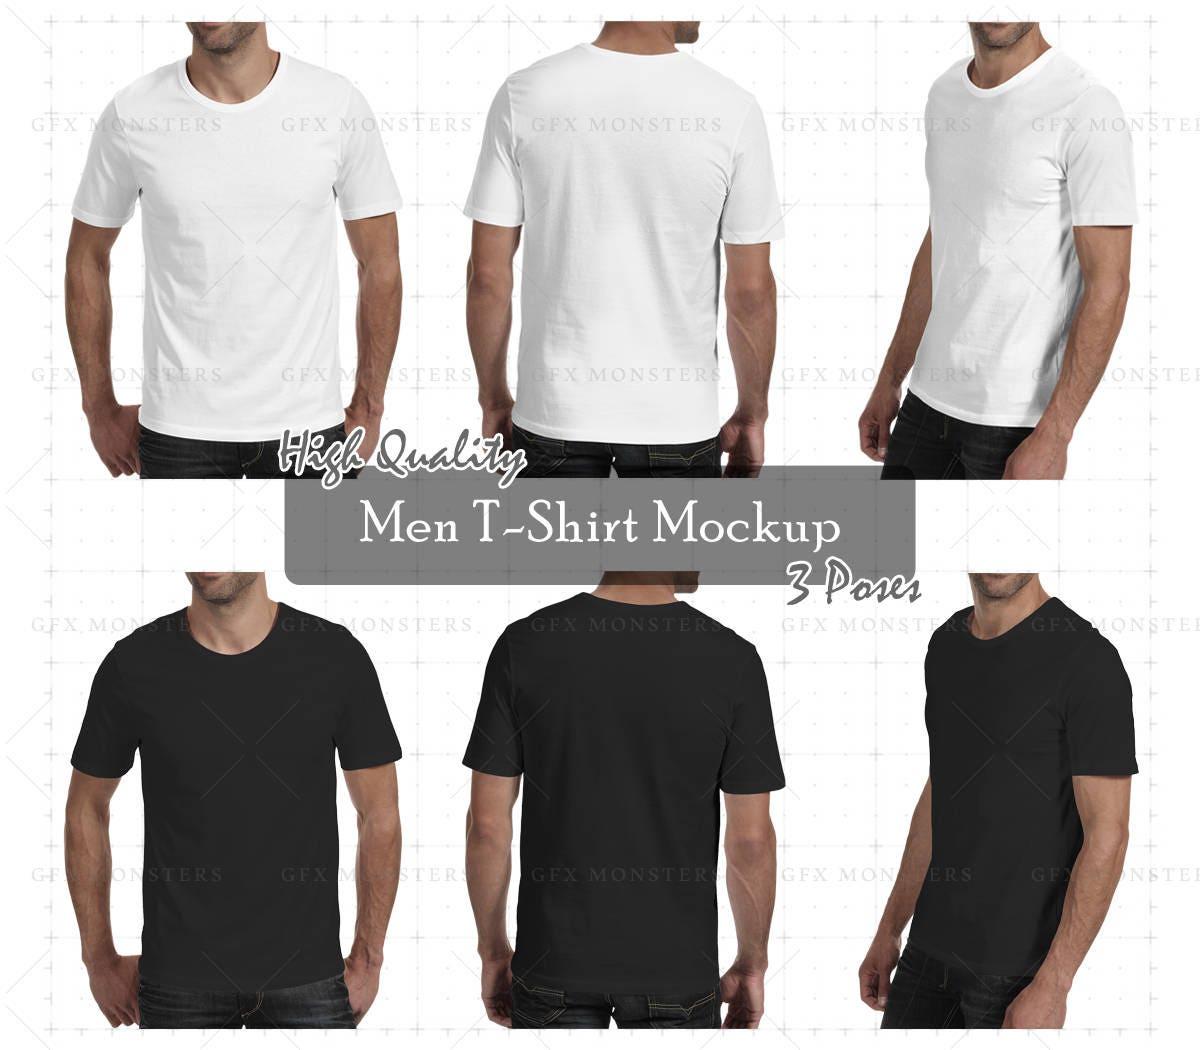 Men tshirt mockup png psd front back perspective for Front and back t shirt mockup